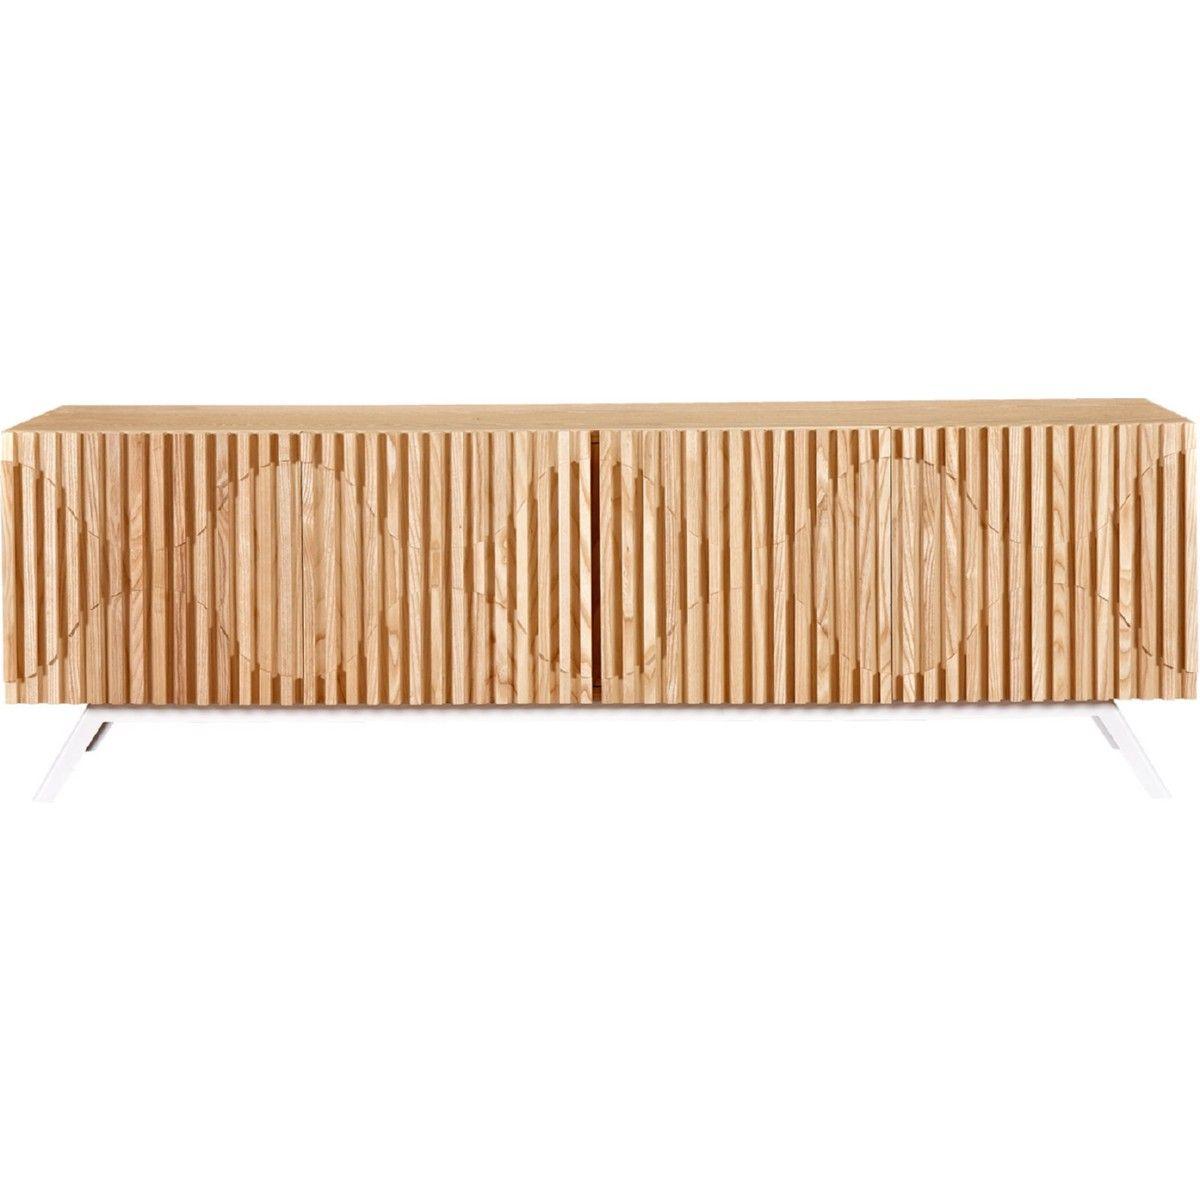 Harkavy furniture focuses on modern pieces made of wood and steel - Nyekoncept Modern Furniture Oskar Vertical Slat Sideboard Buffet W Stainless Steel Legs Natural